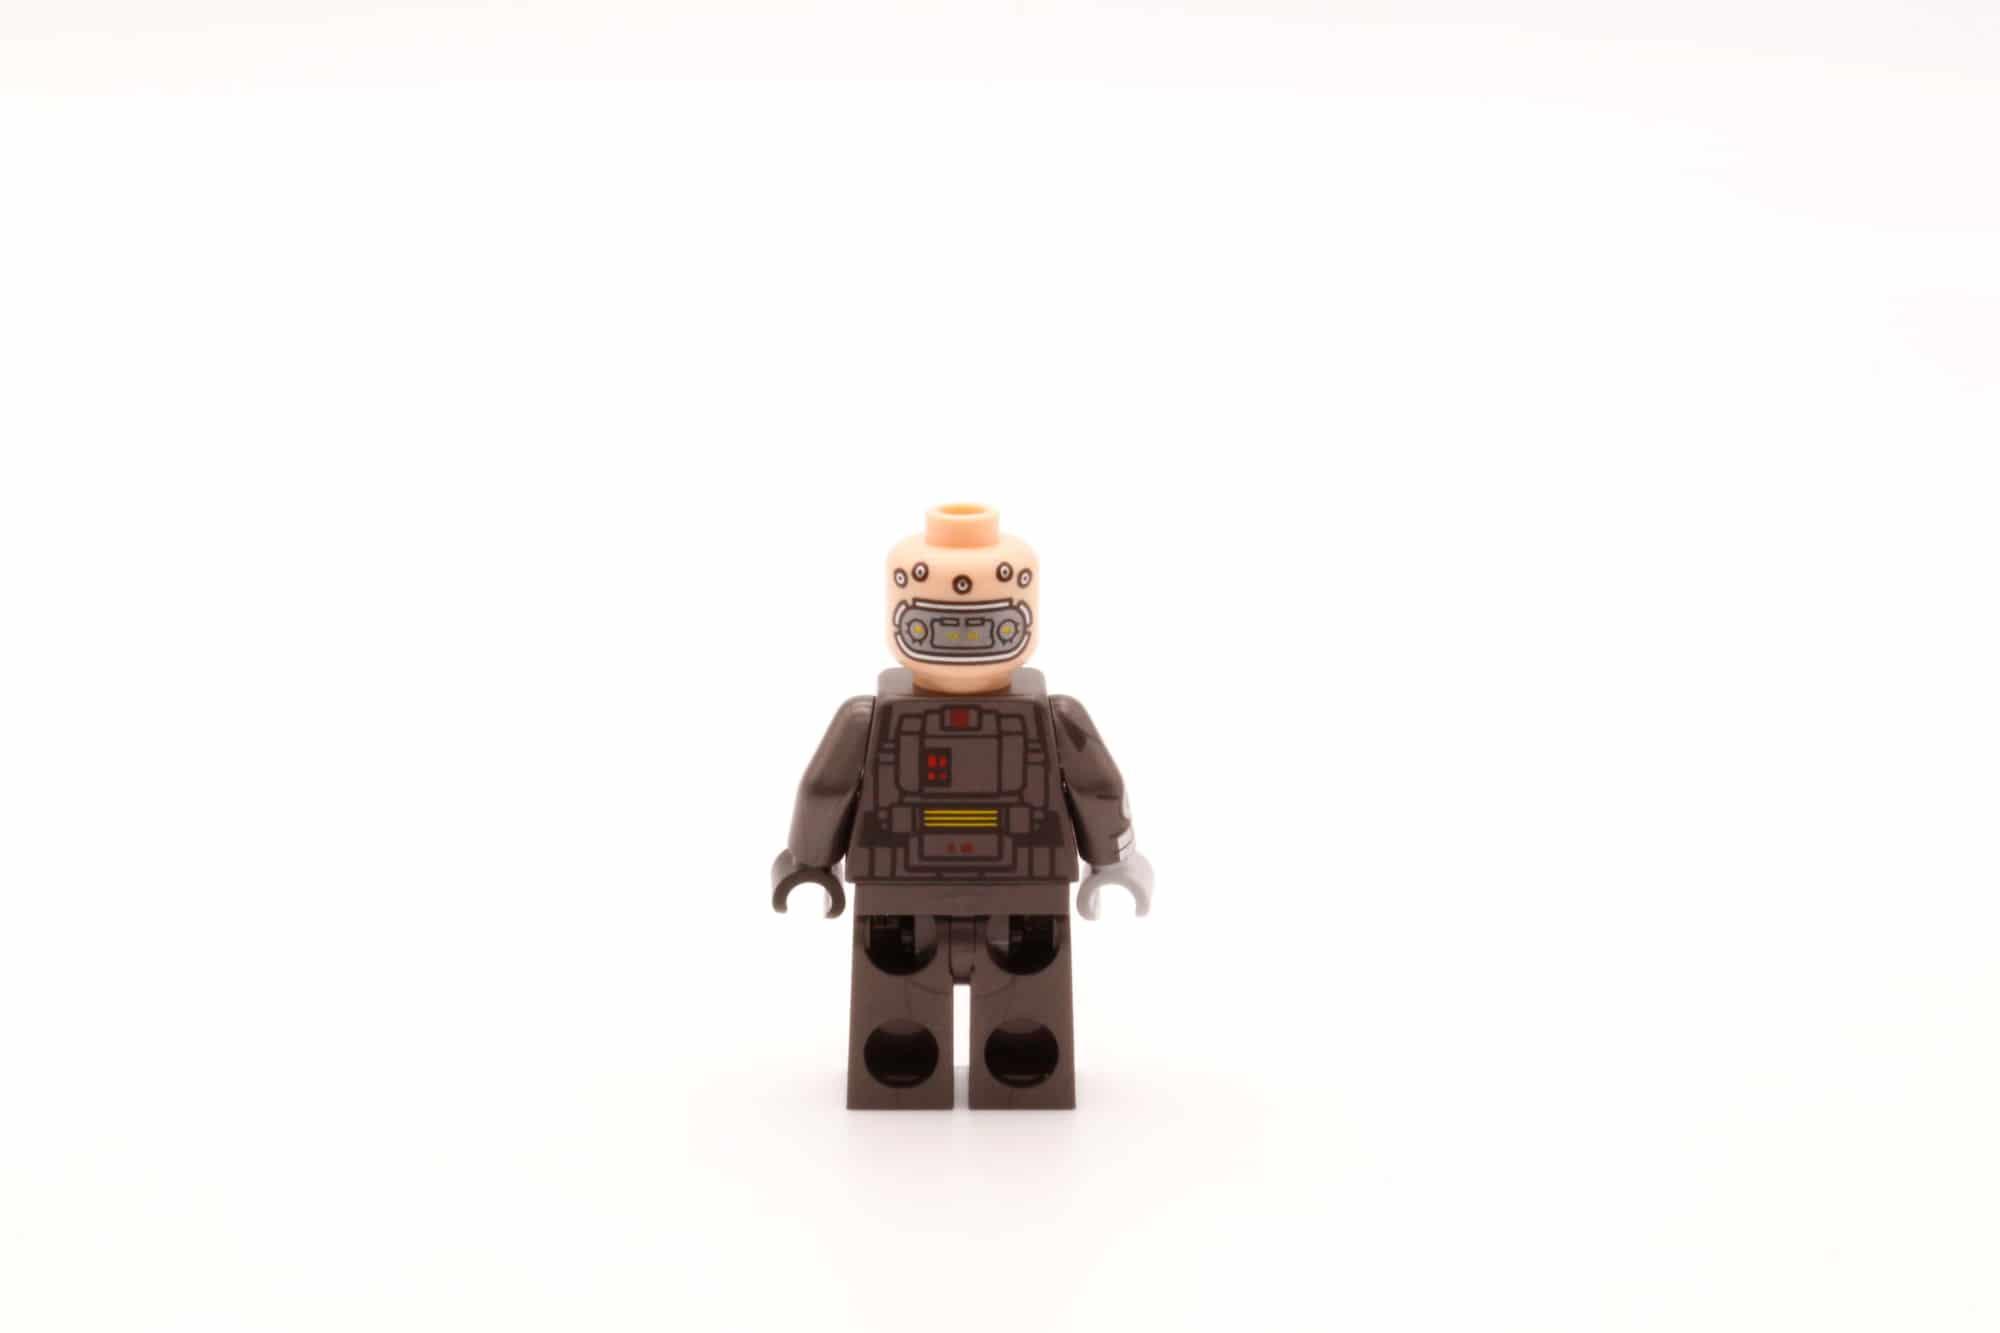 LEGO Star Wars 75314 The Bad Batch Attack Shuttle Echo Rückseite